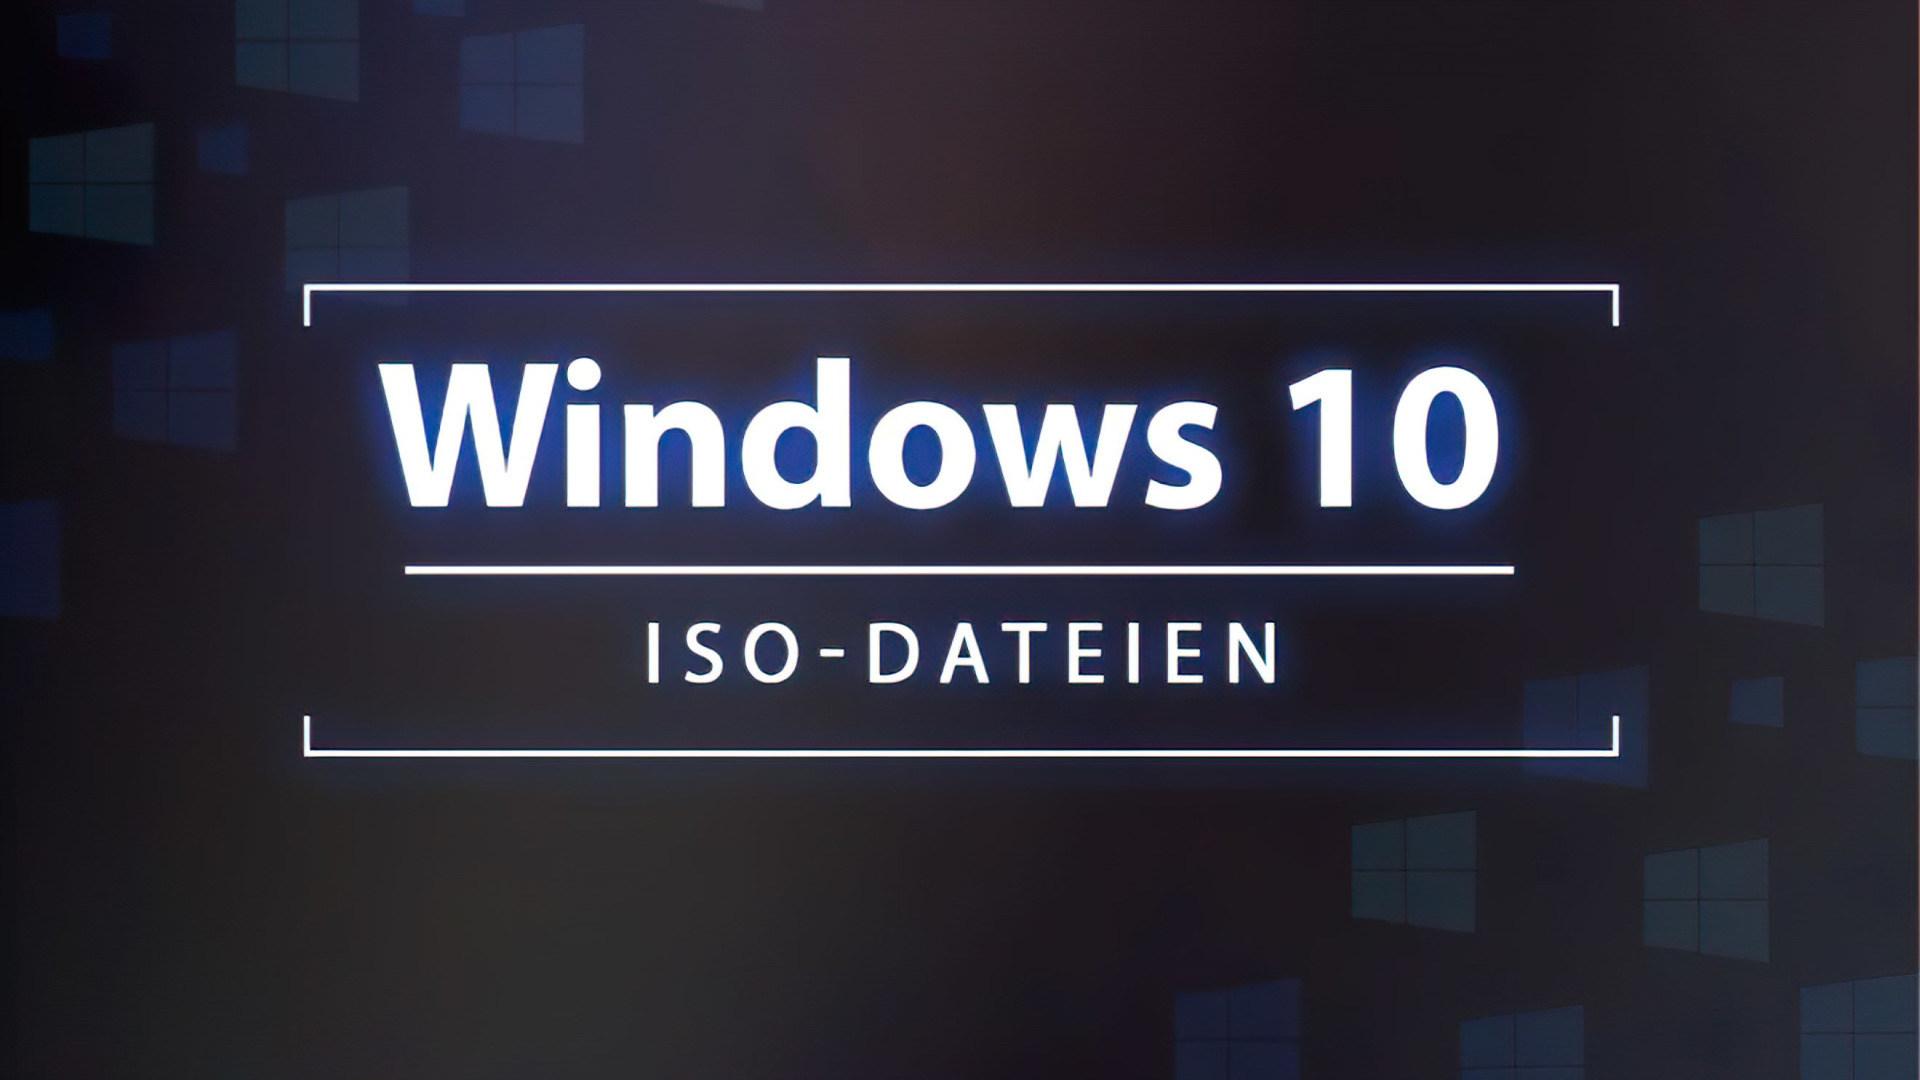 Microsoft, Windows 10, Iso